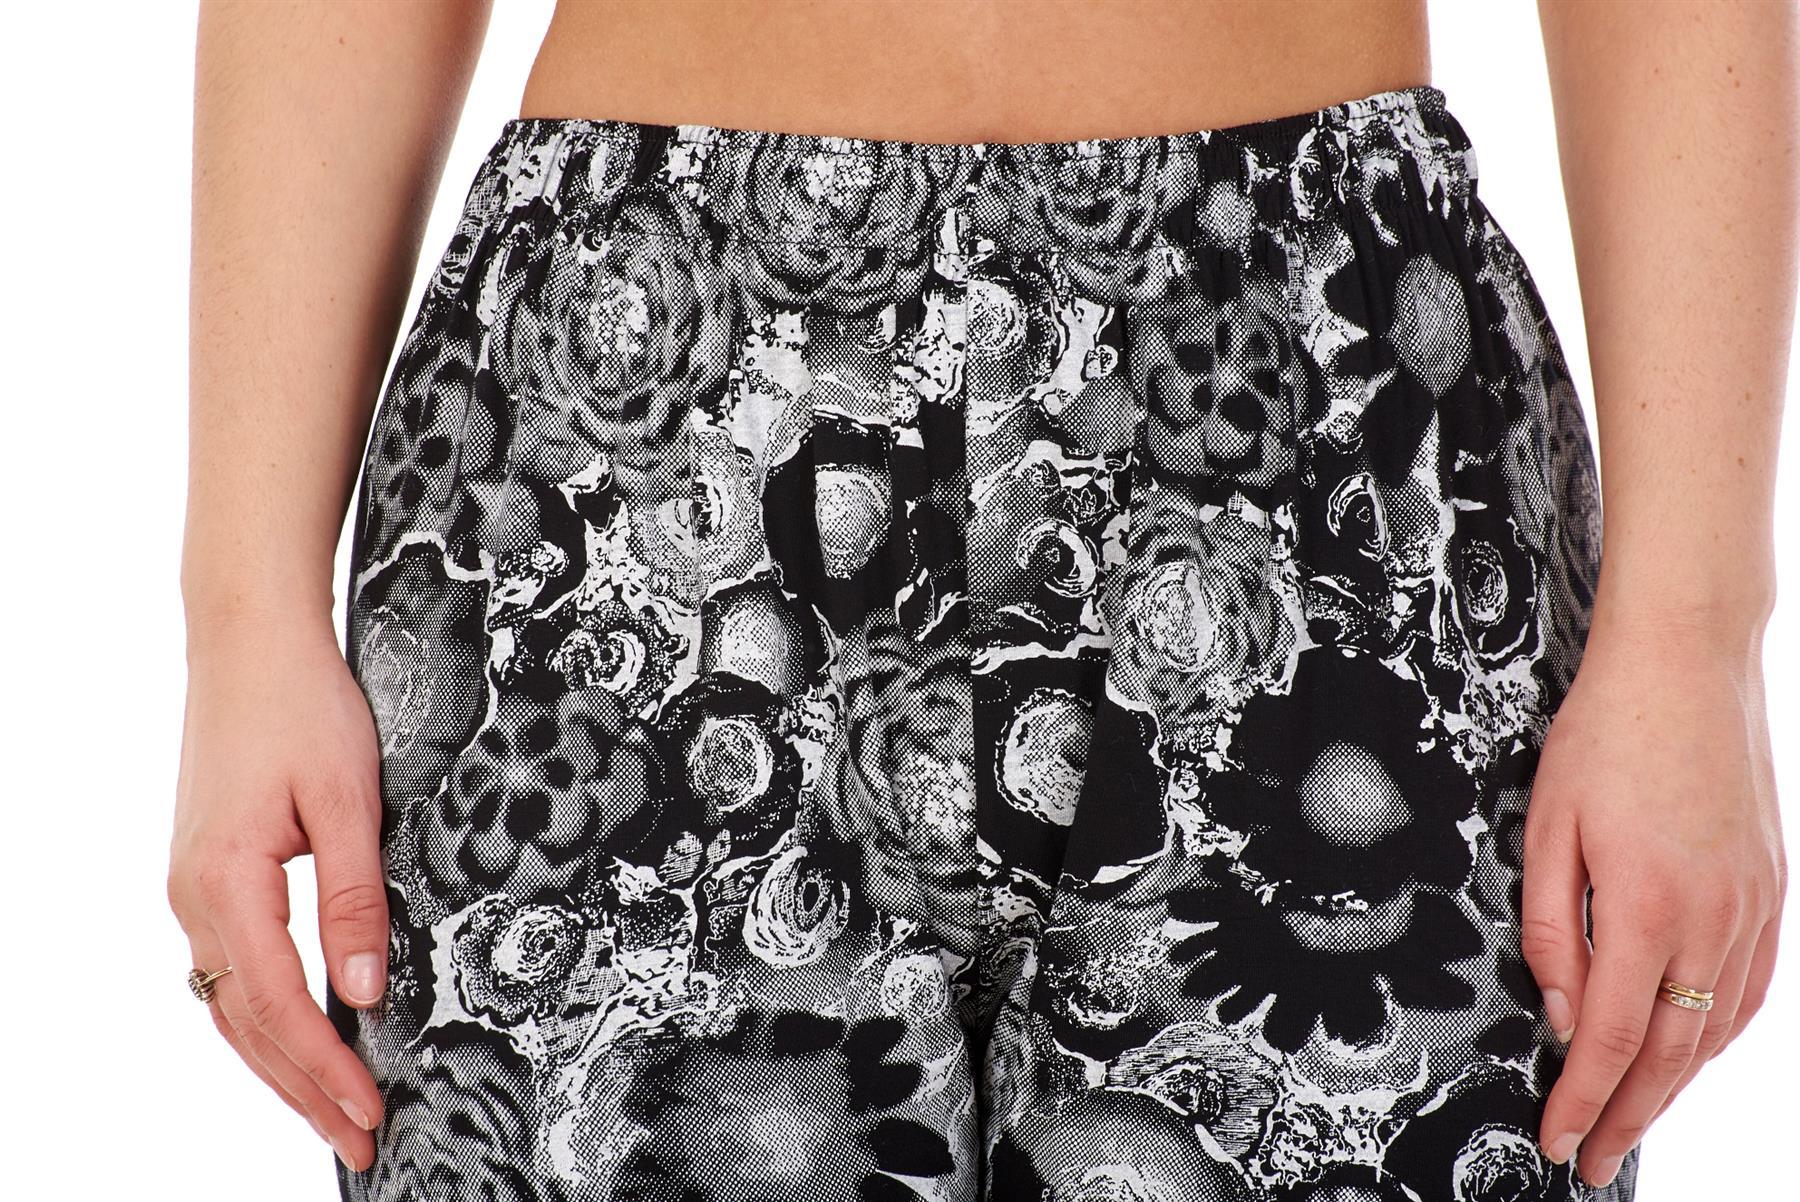 Ladies-Women-Trouser-Elasticated-Printed-Tapered-Harem-High-waist-Regular-Pants thumbnail 5